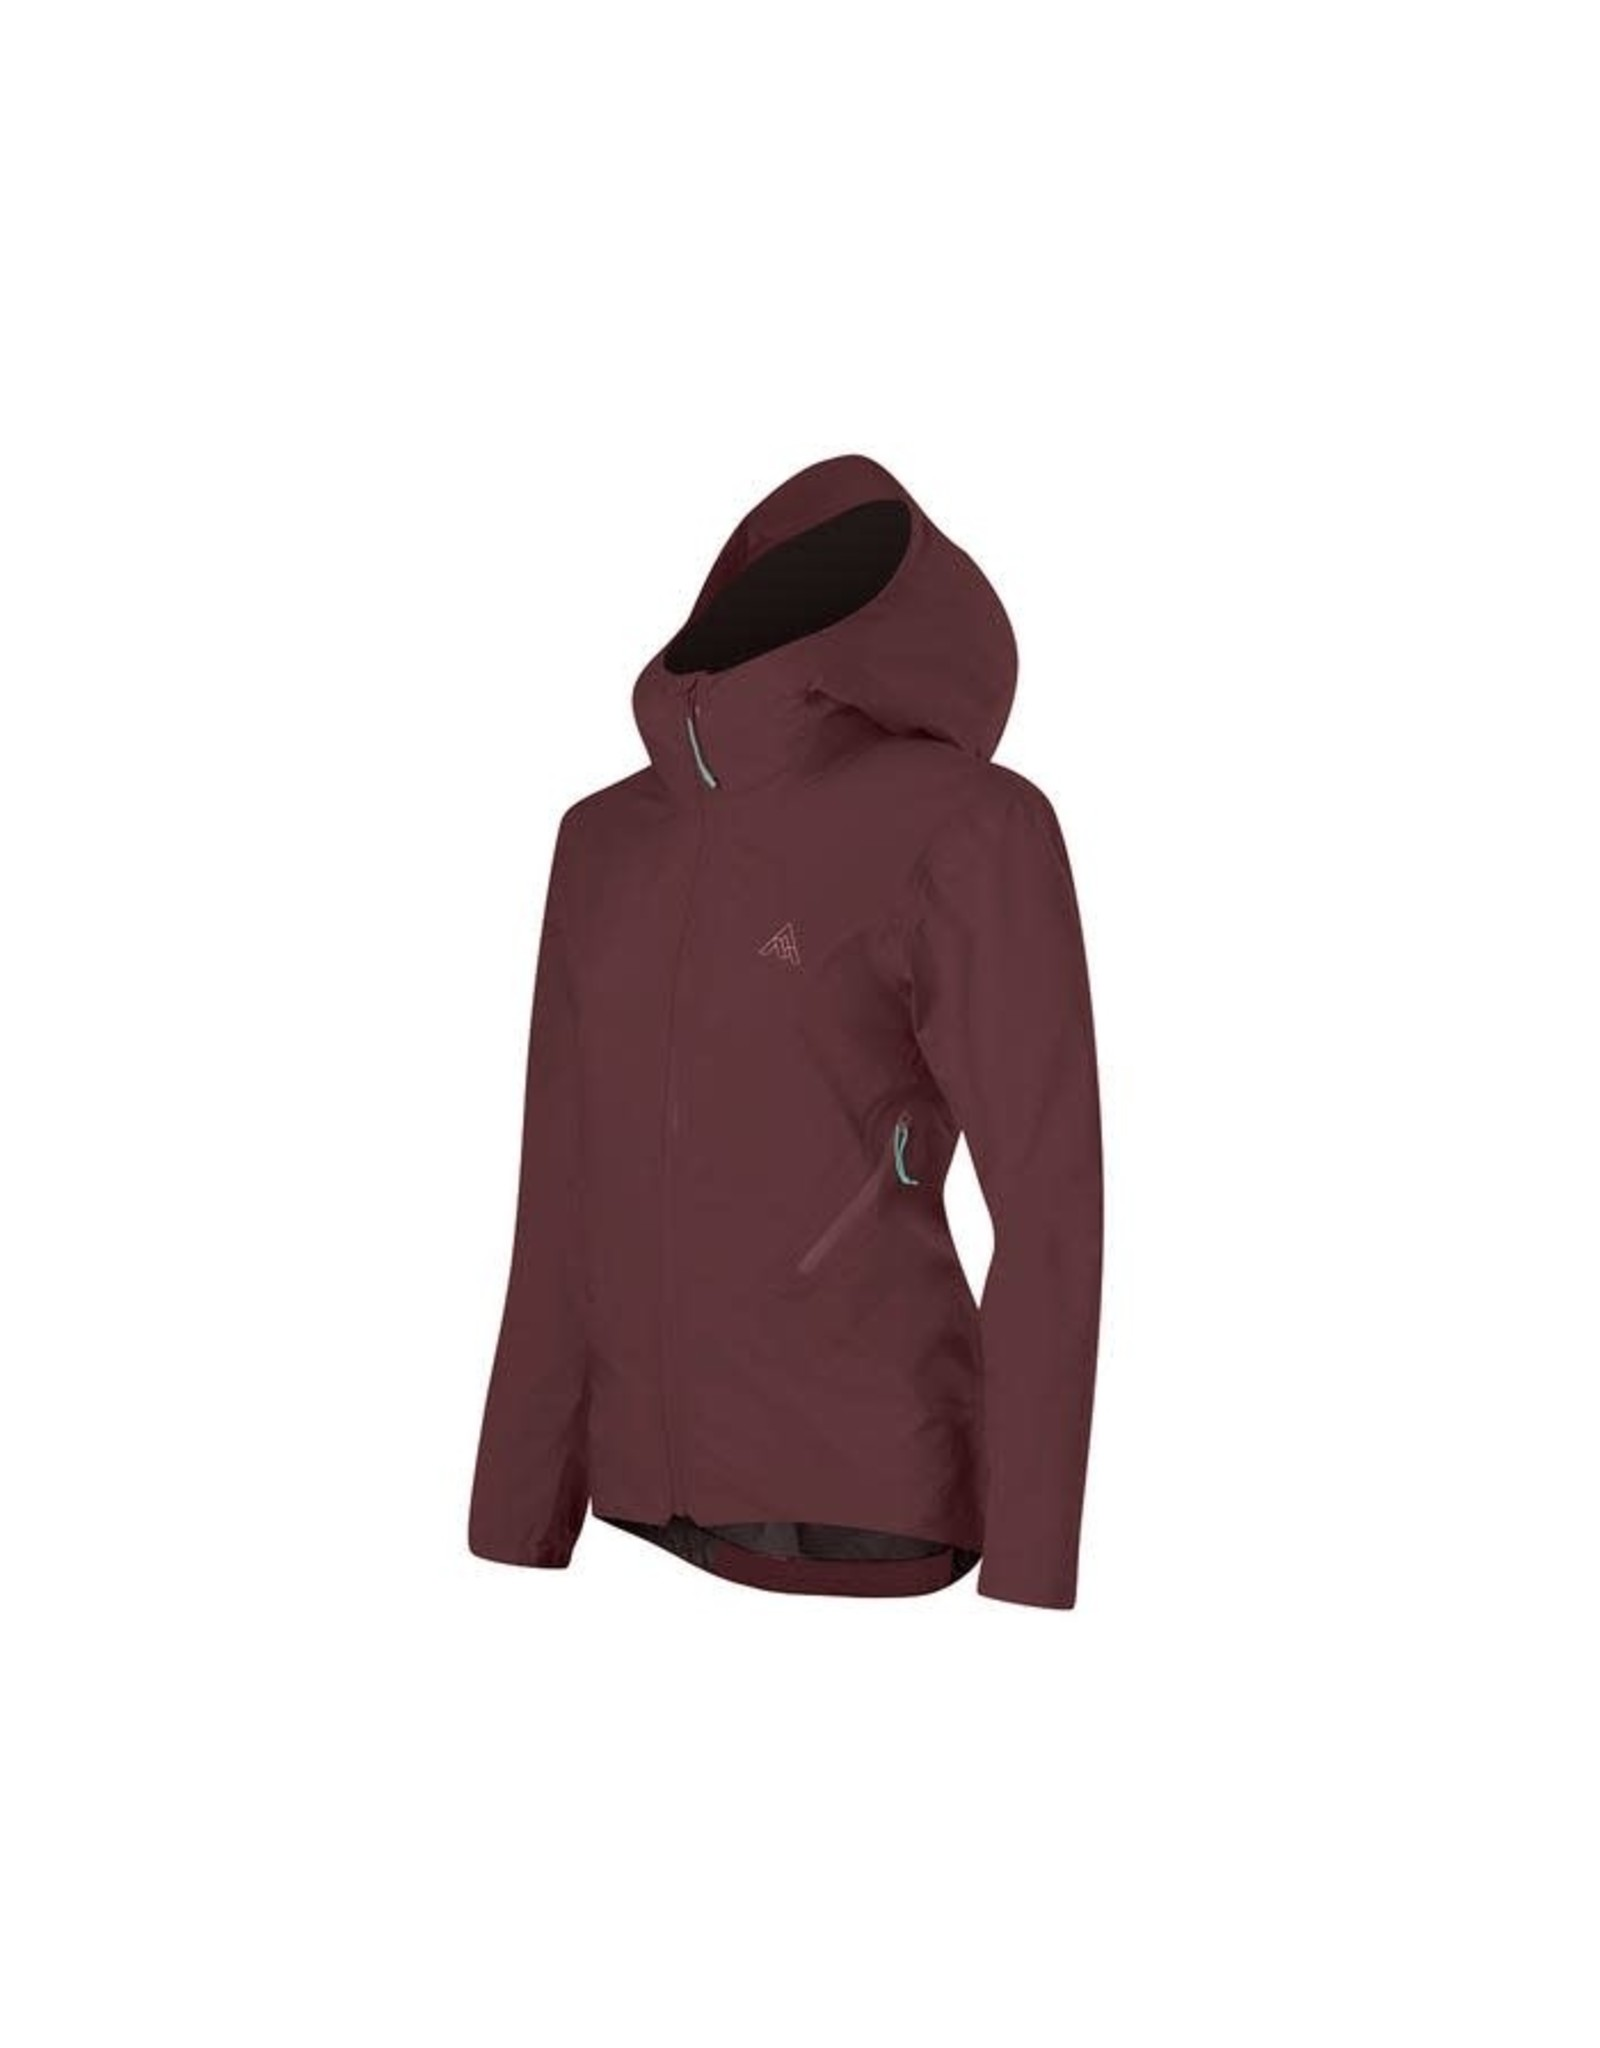 7MESH 7MESH - Copilot Jacket Port Women's Lrg